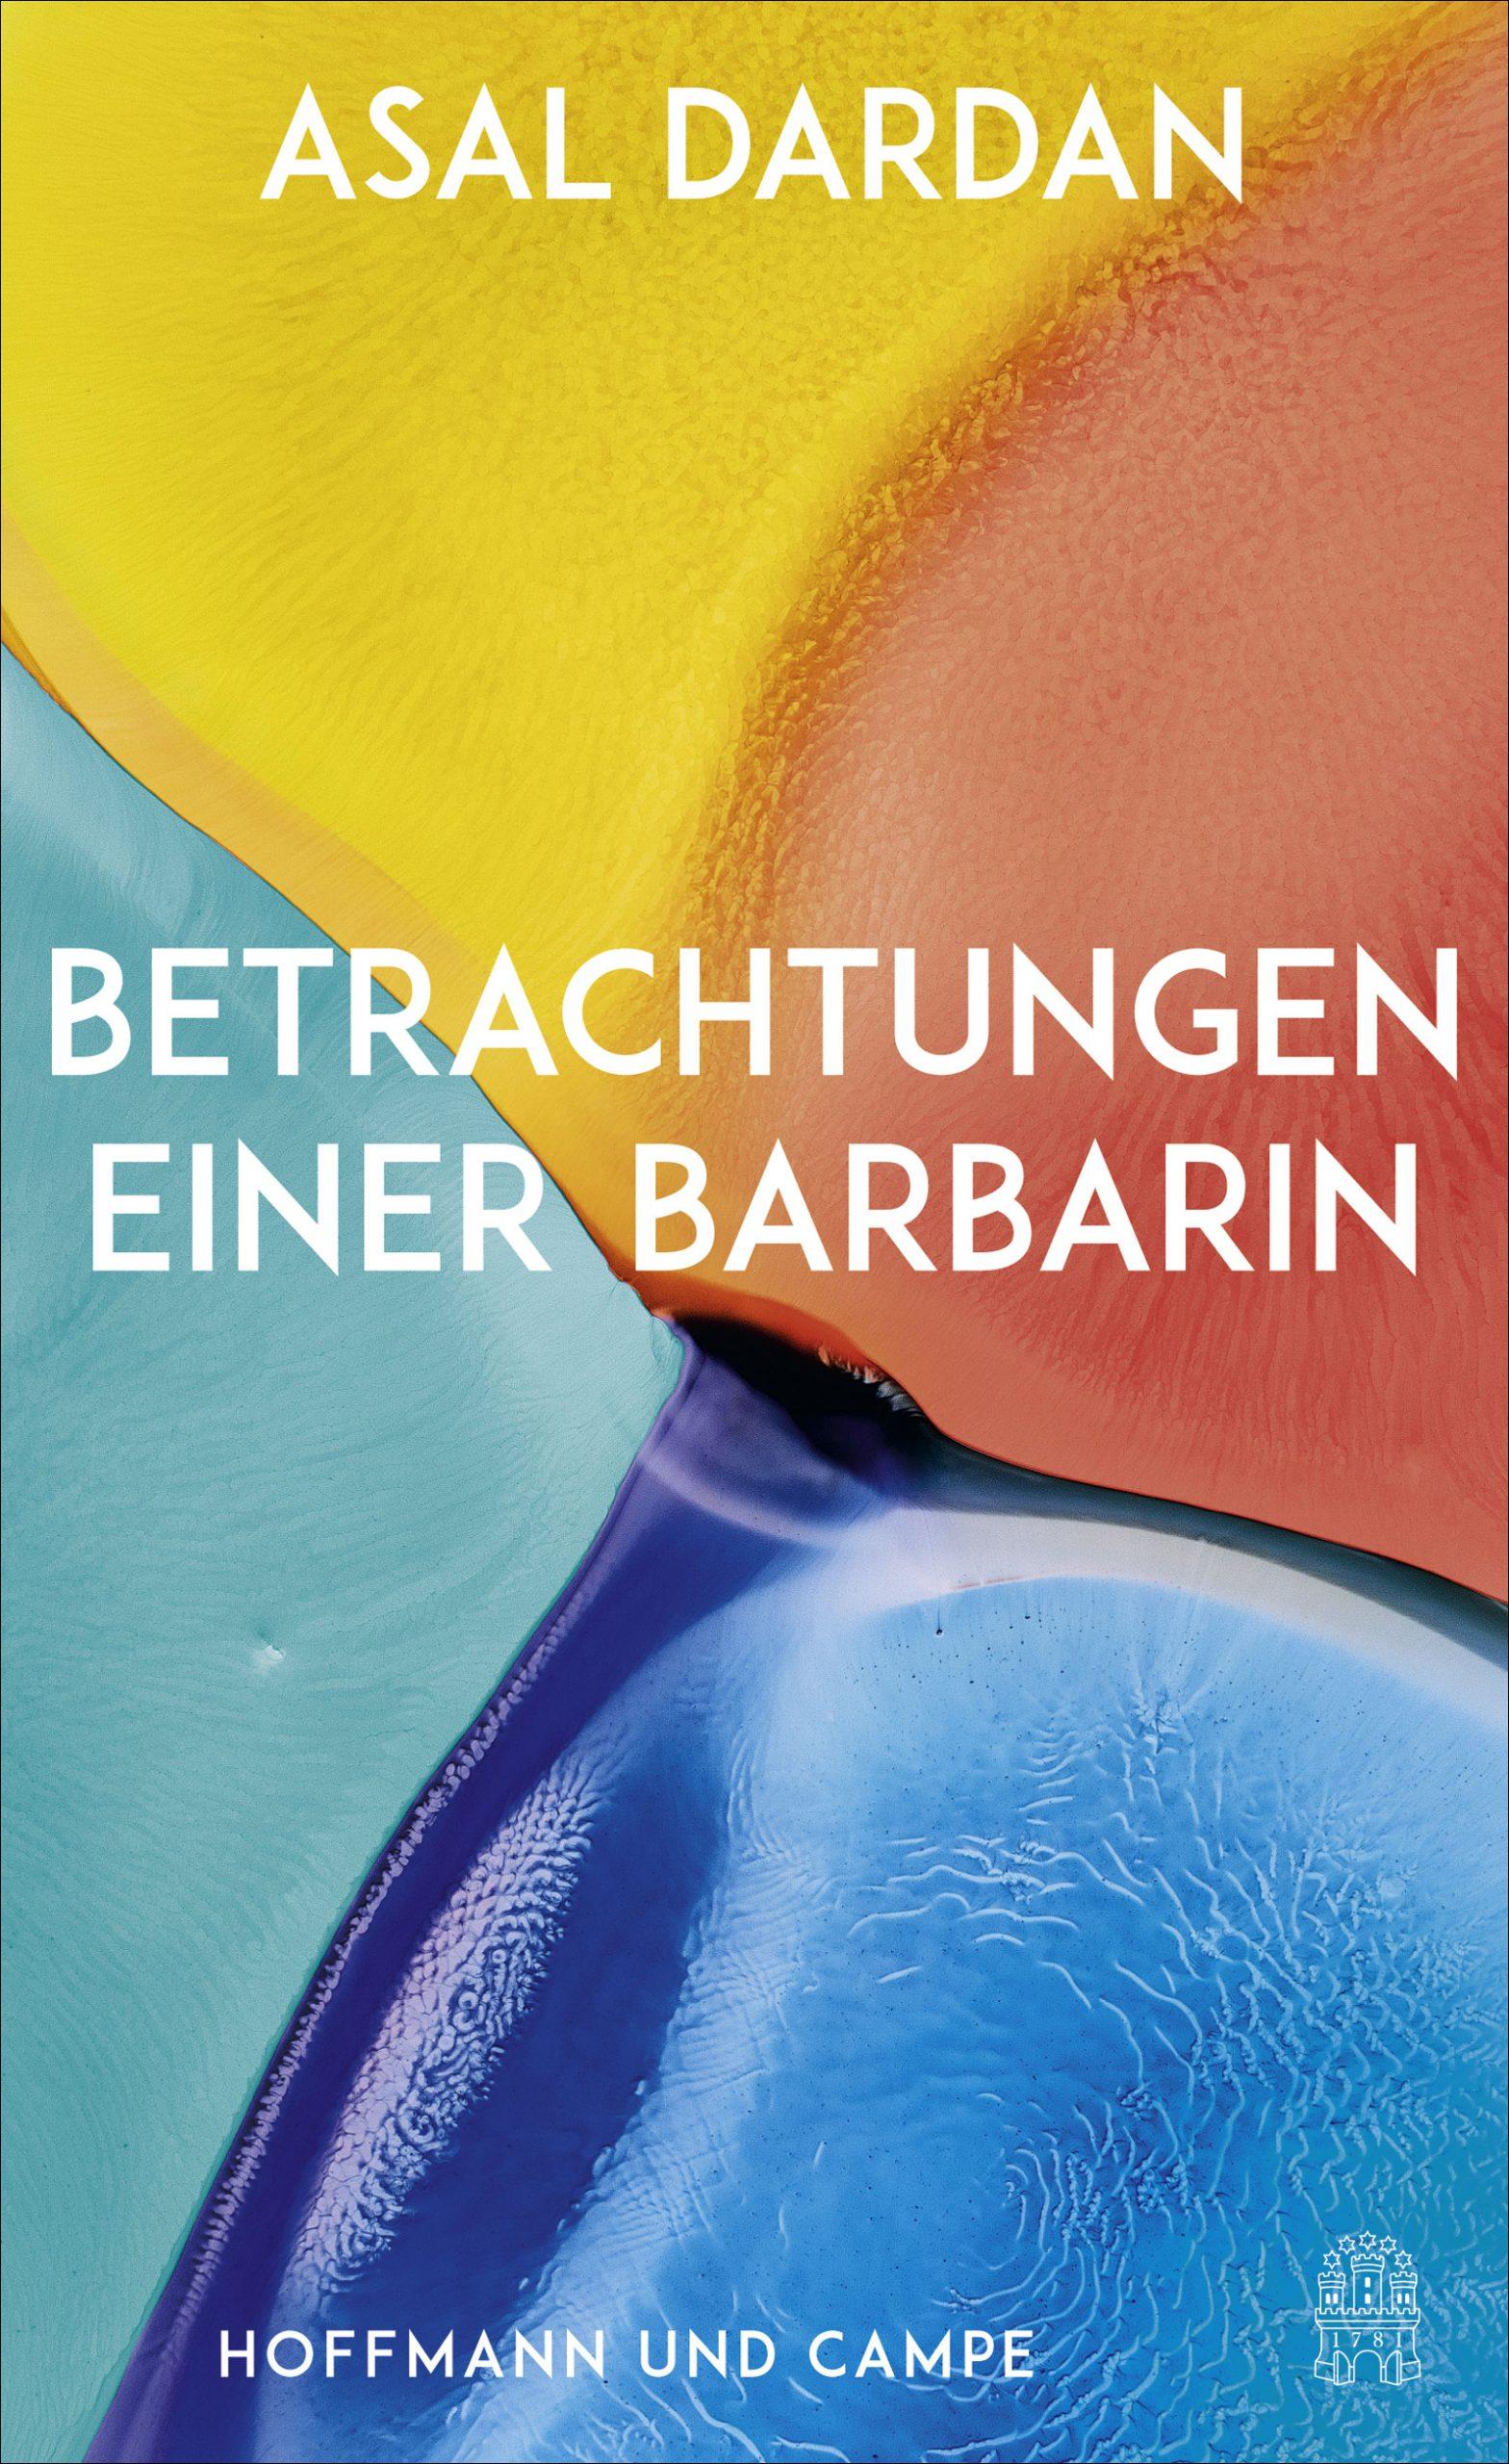 Asal Dardan: Betrachtungen einer Barbarin, Hoffmann & Campe